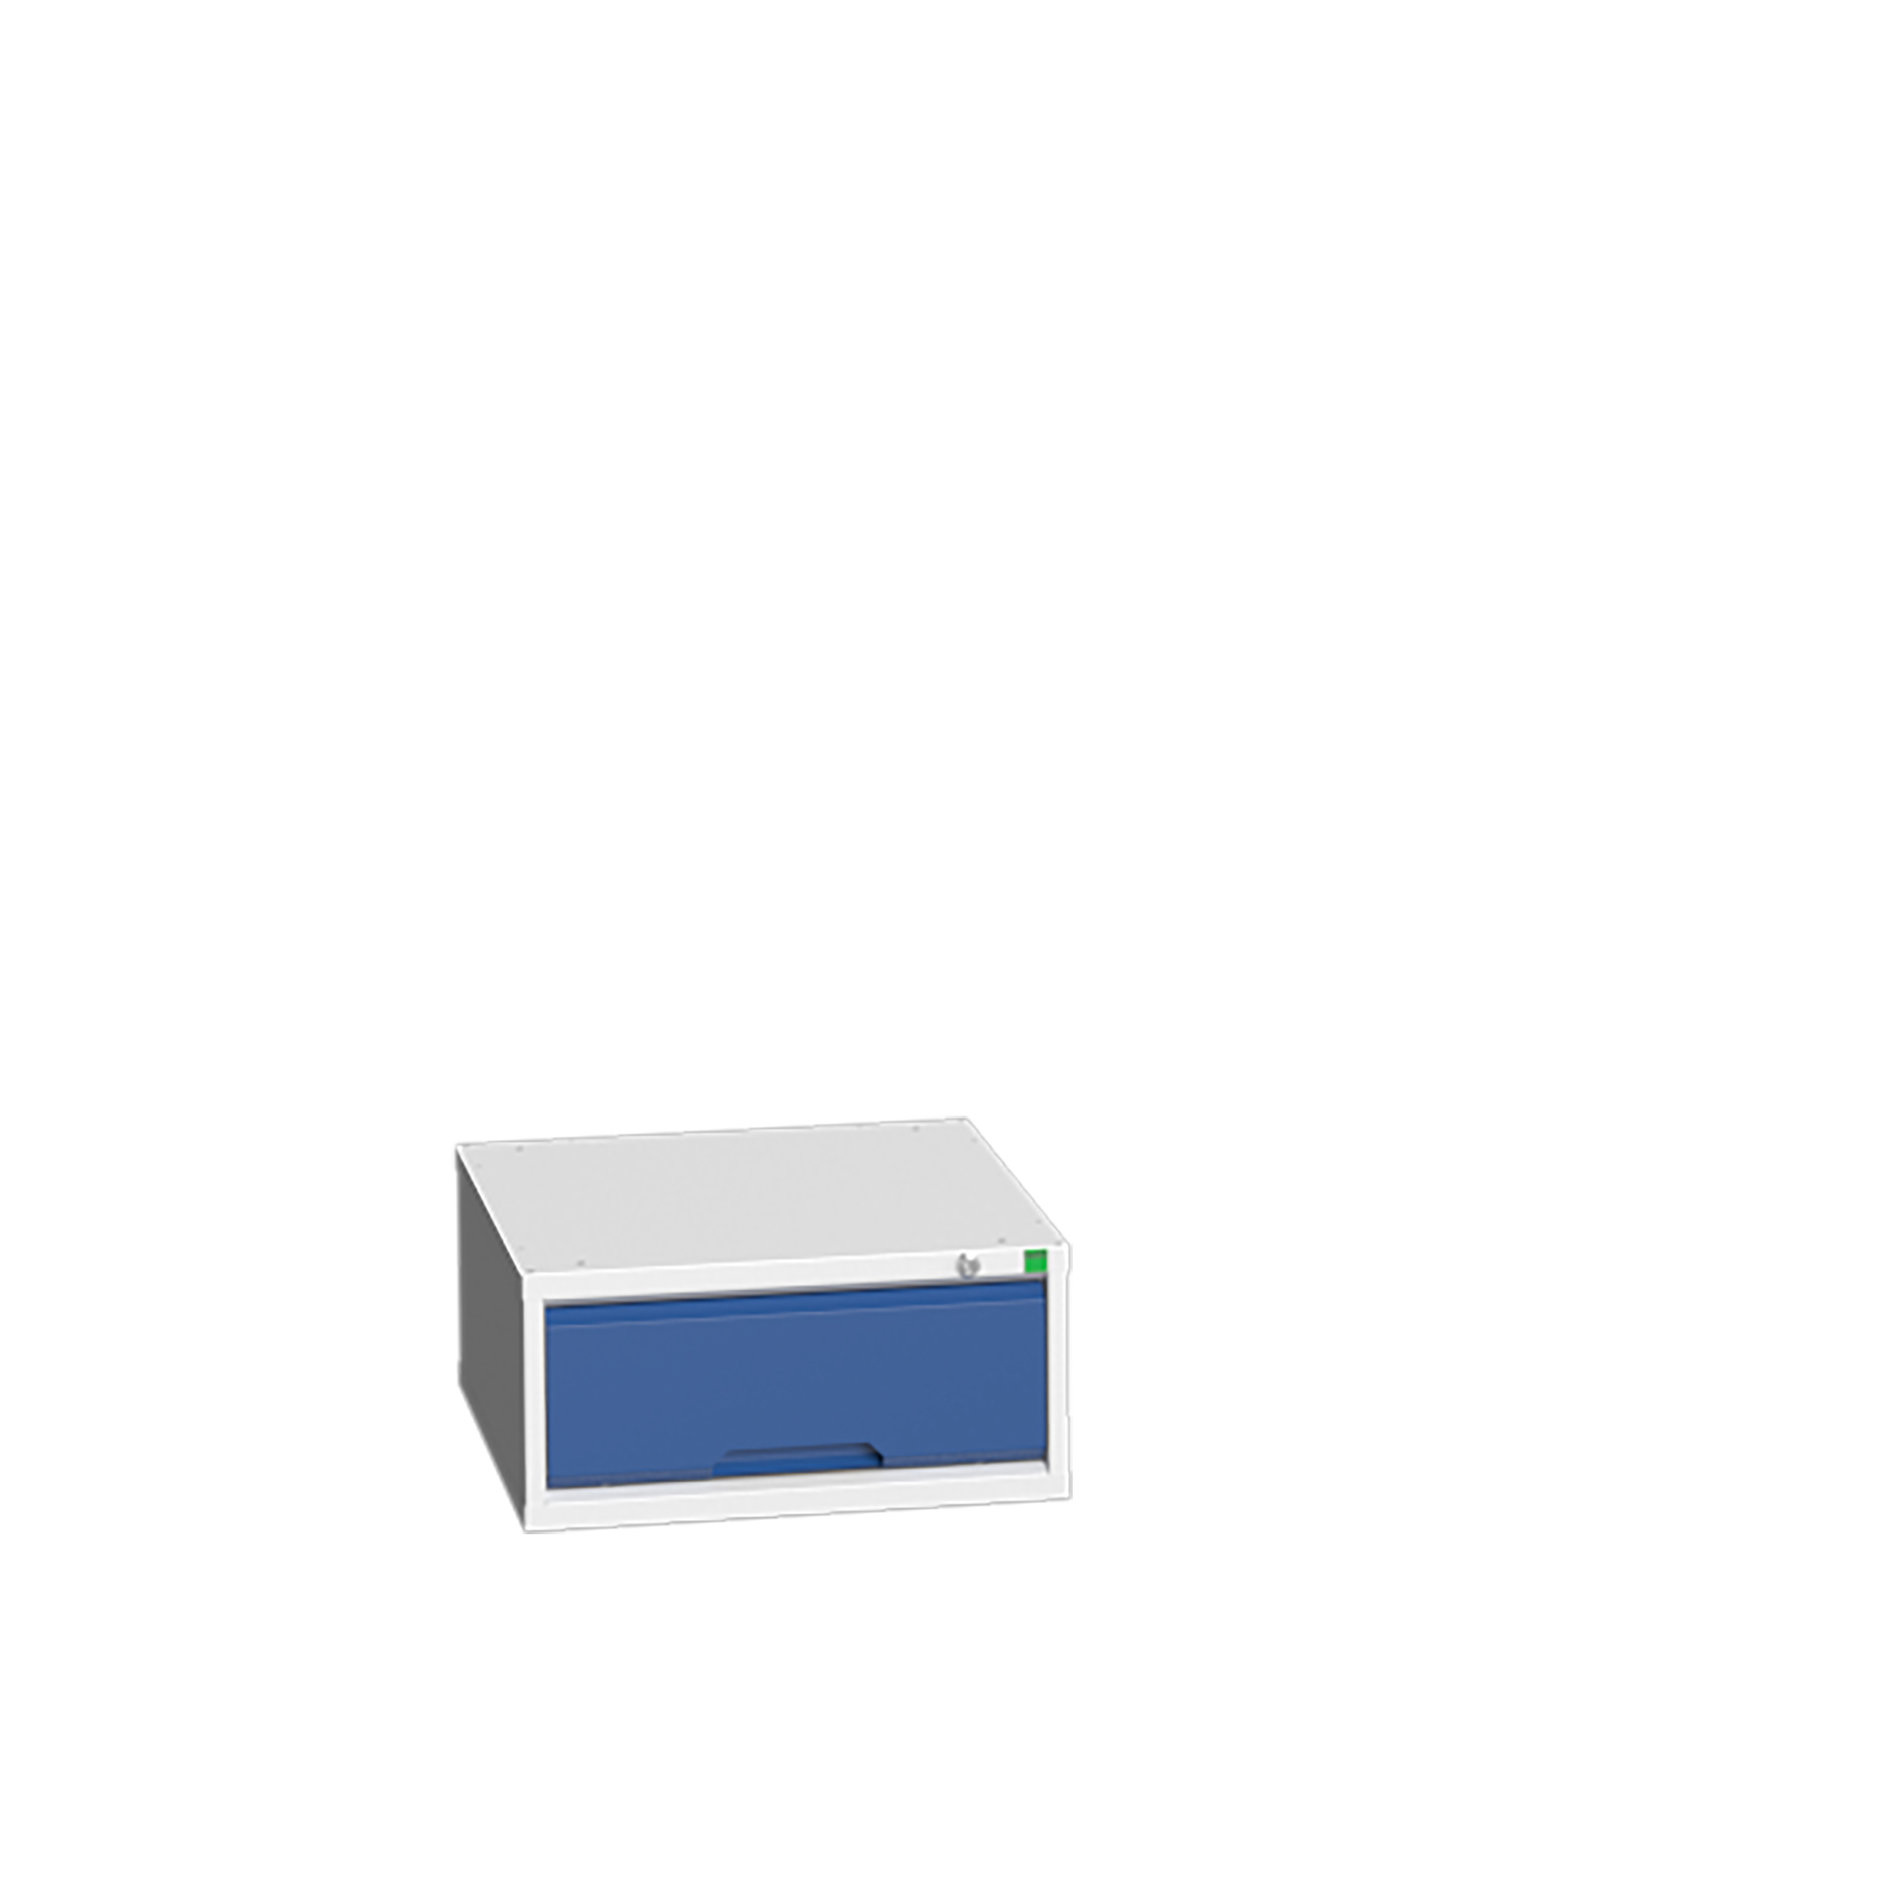 Bott Verso Drawer Cabinet With 1 Drawer